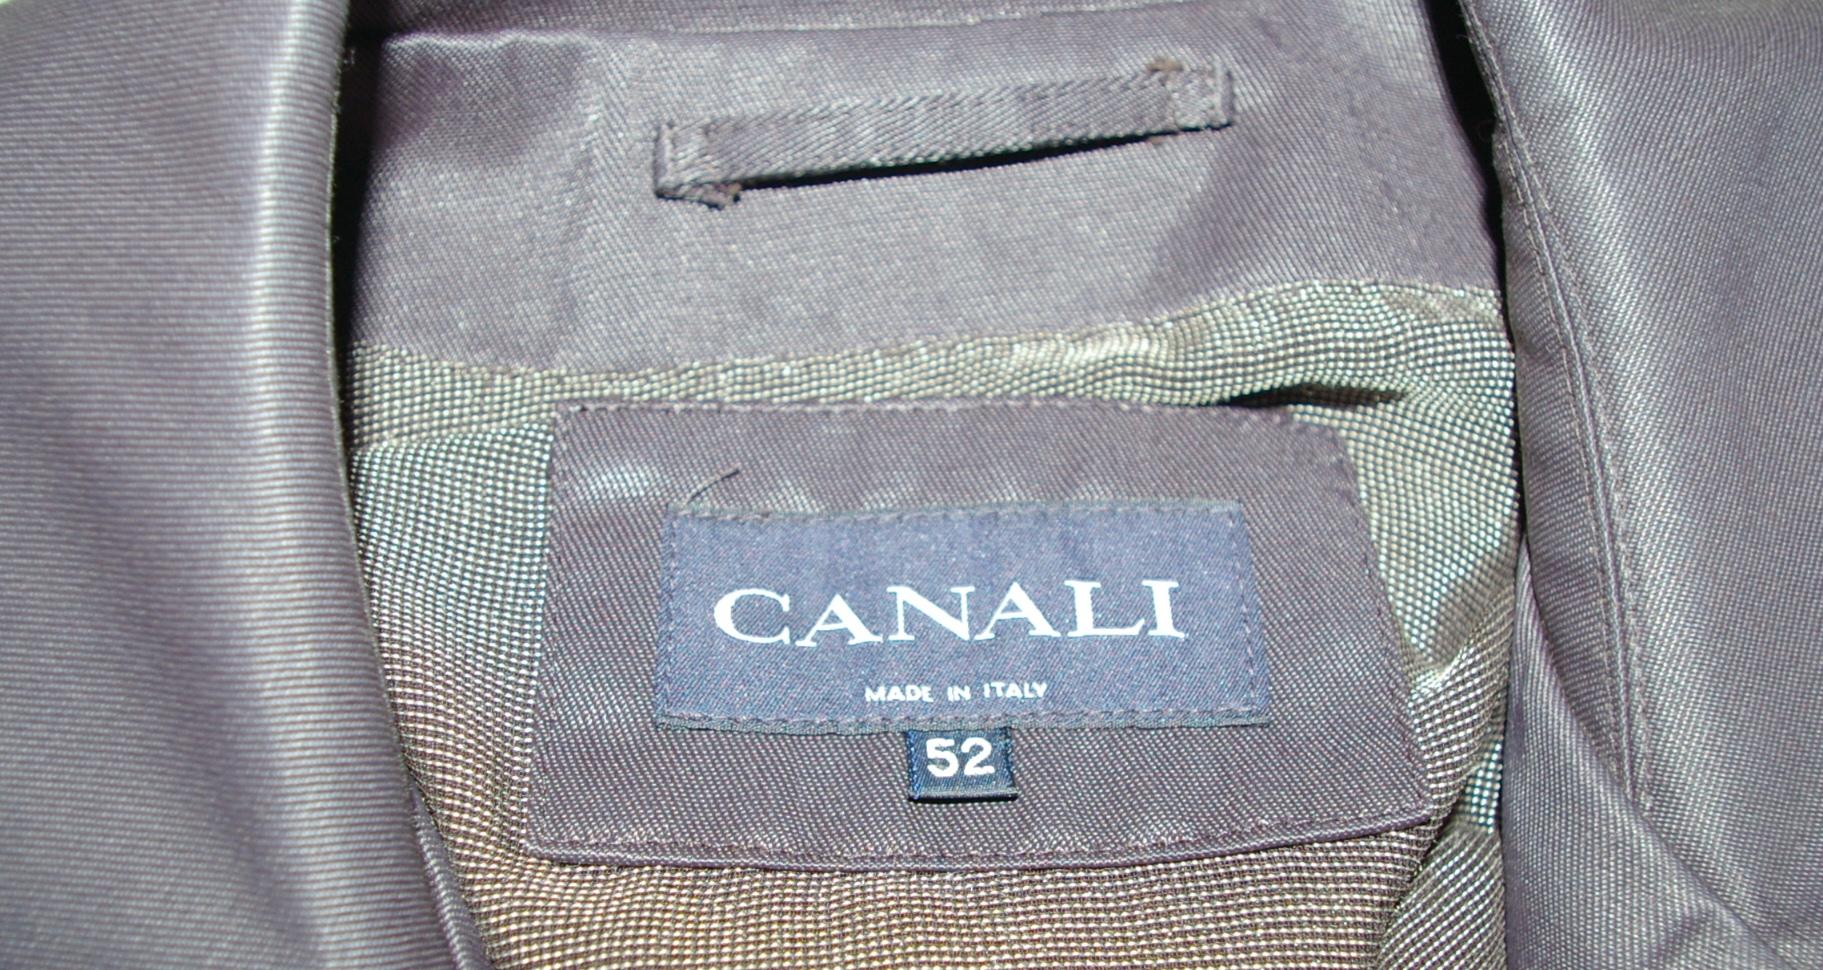 Canali 003.JPG